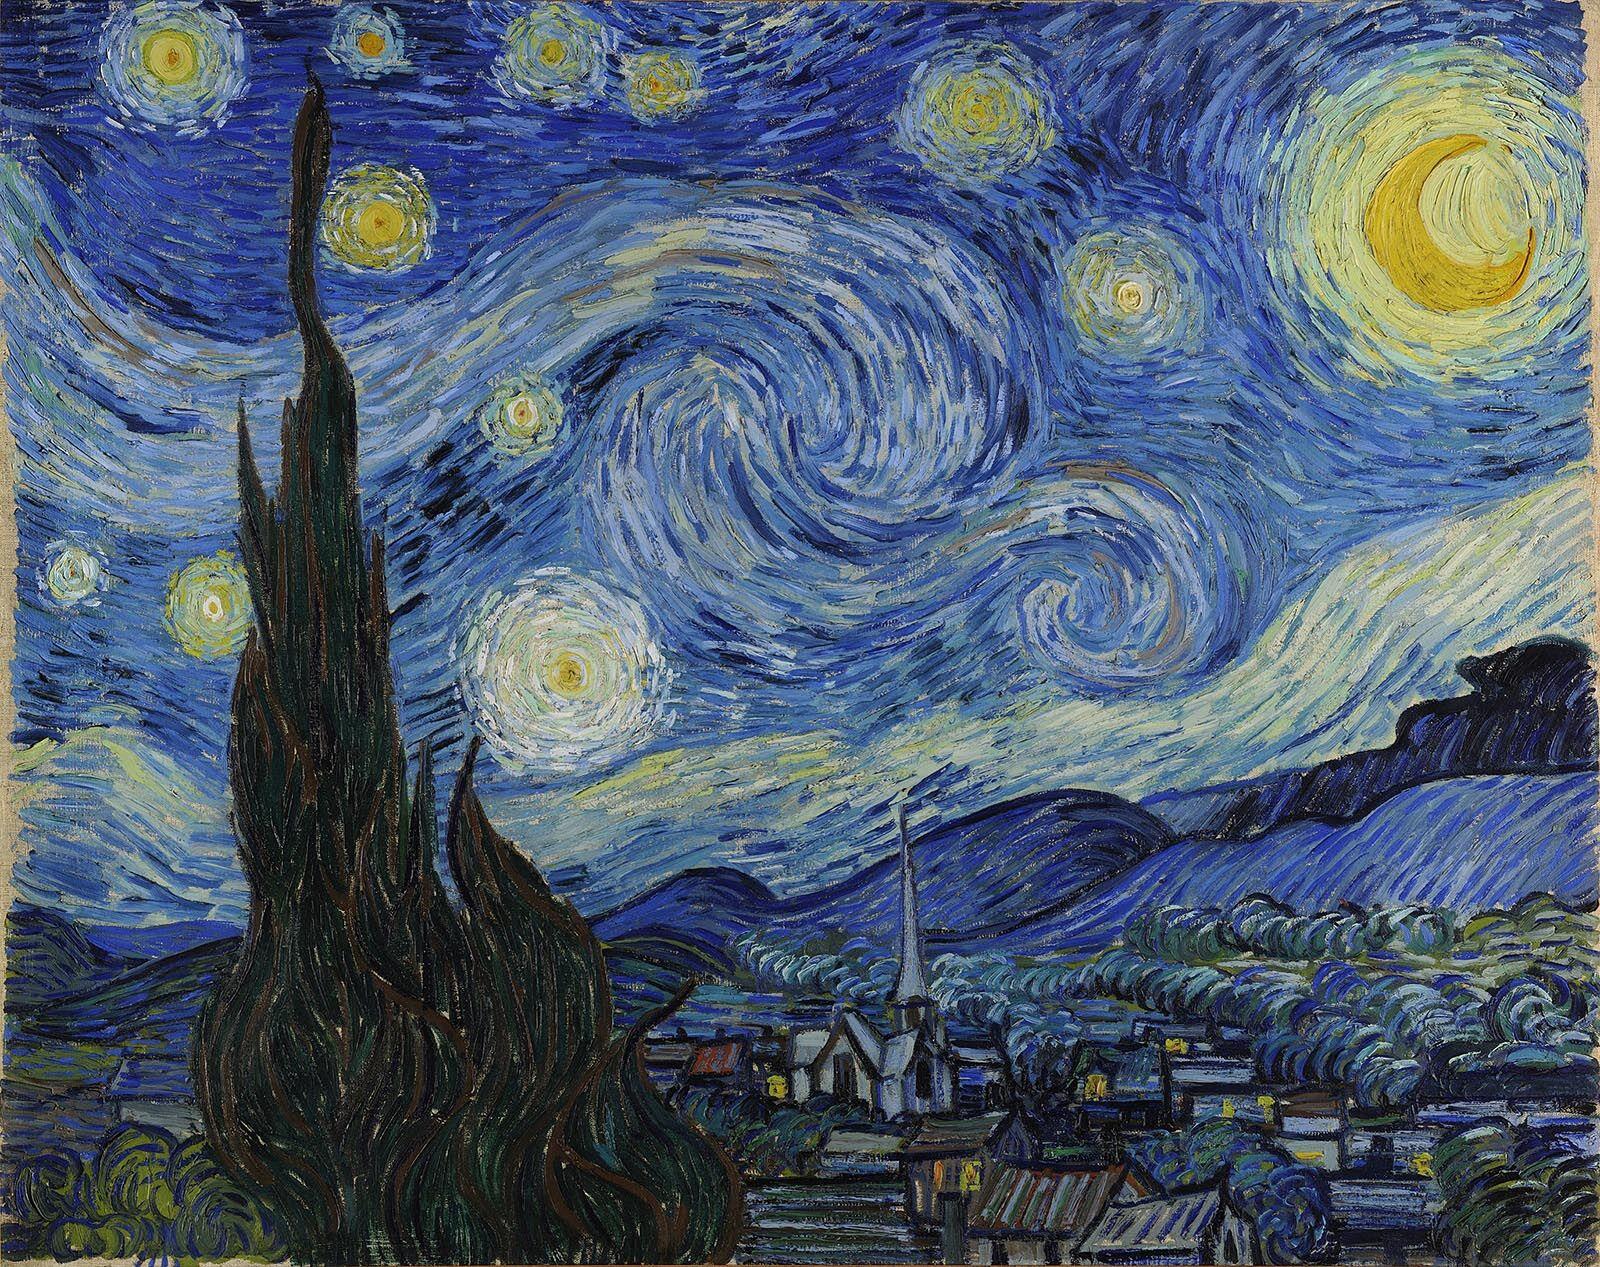 Vincent Van Goh, The Starry Night, 1889, The Museum of Modern Art